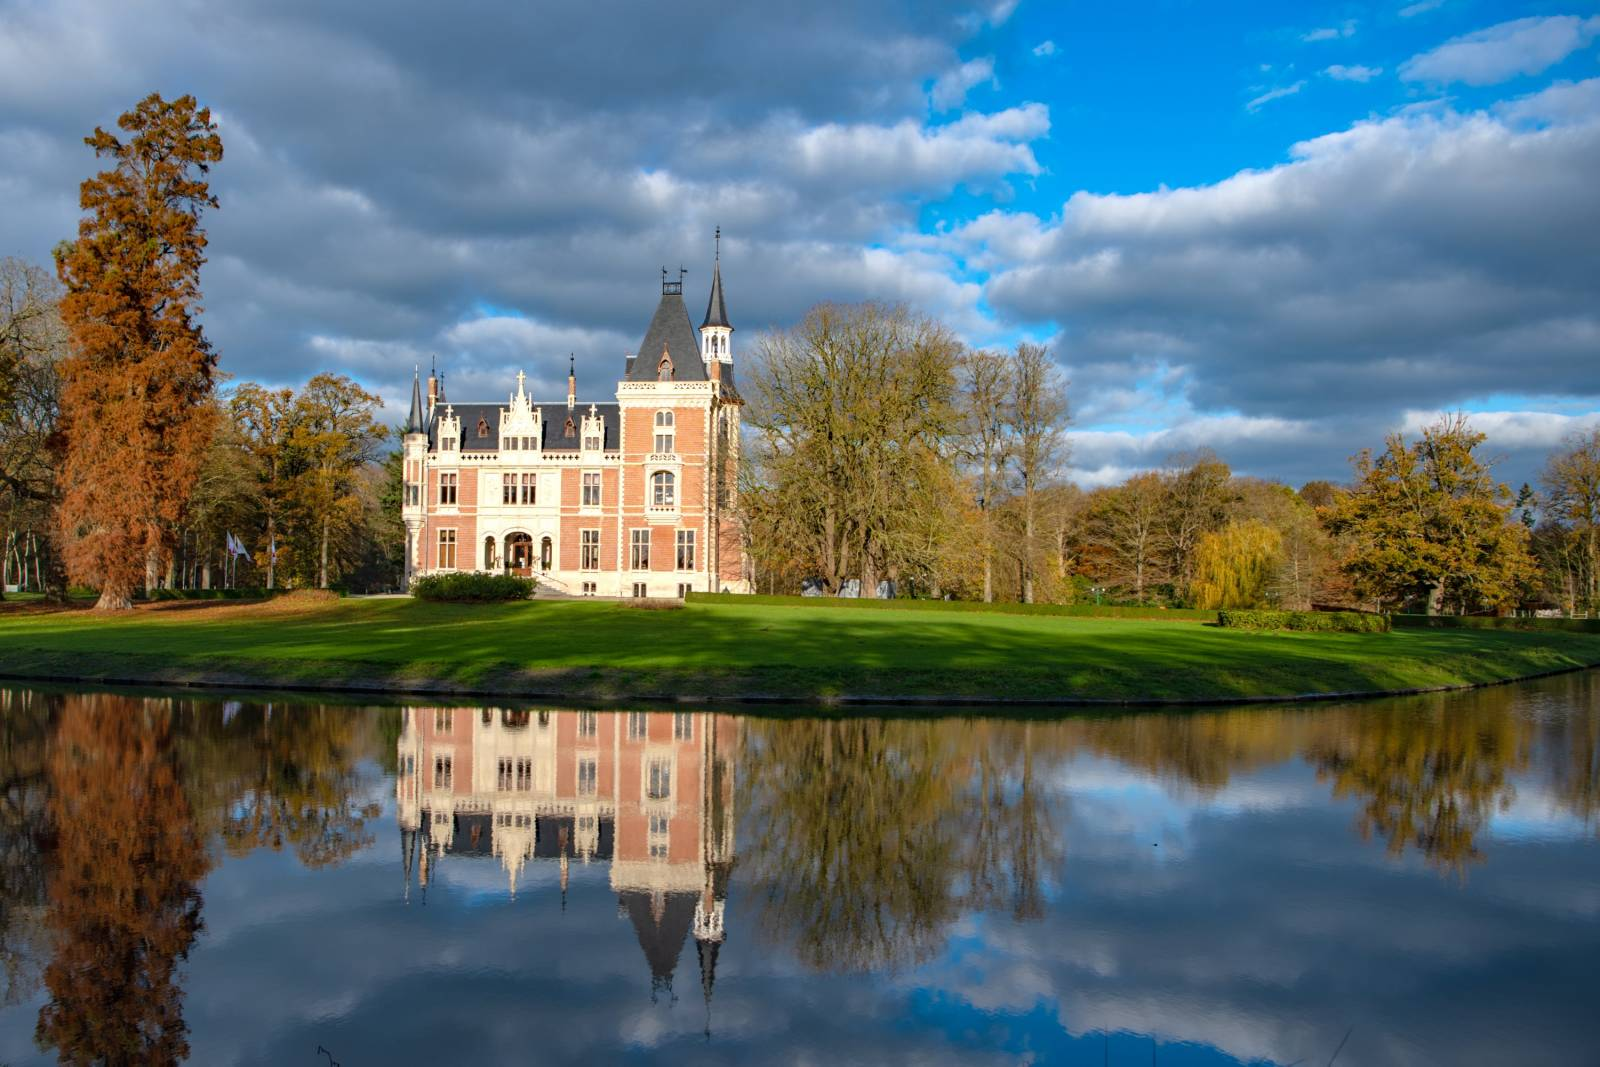 Kasteel D'artrycke - Feestzaal - House of Weddings (3)